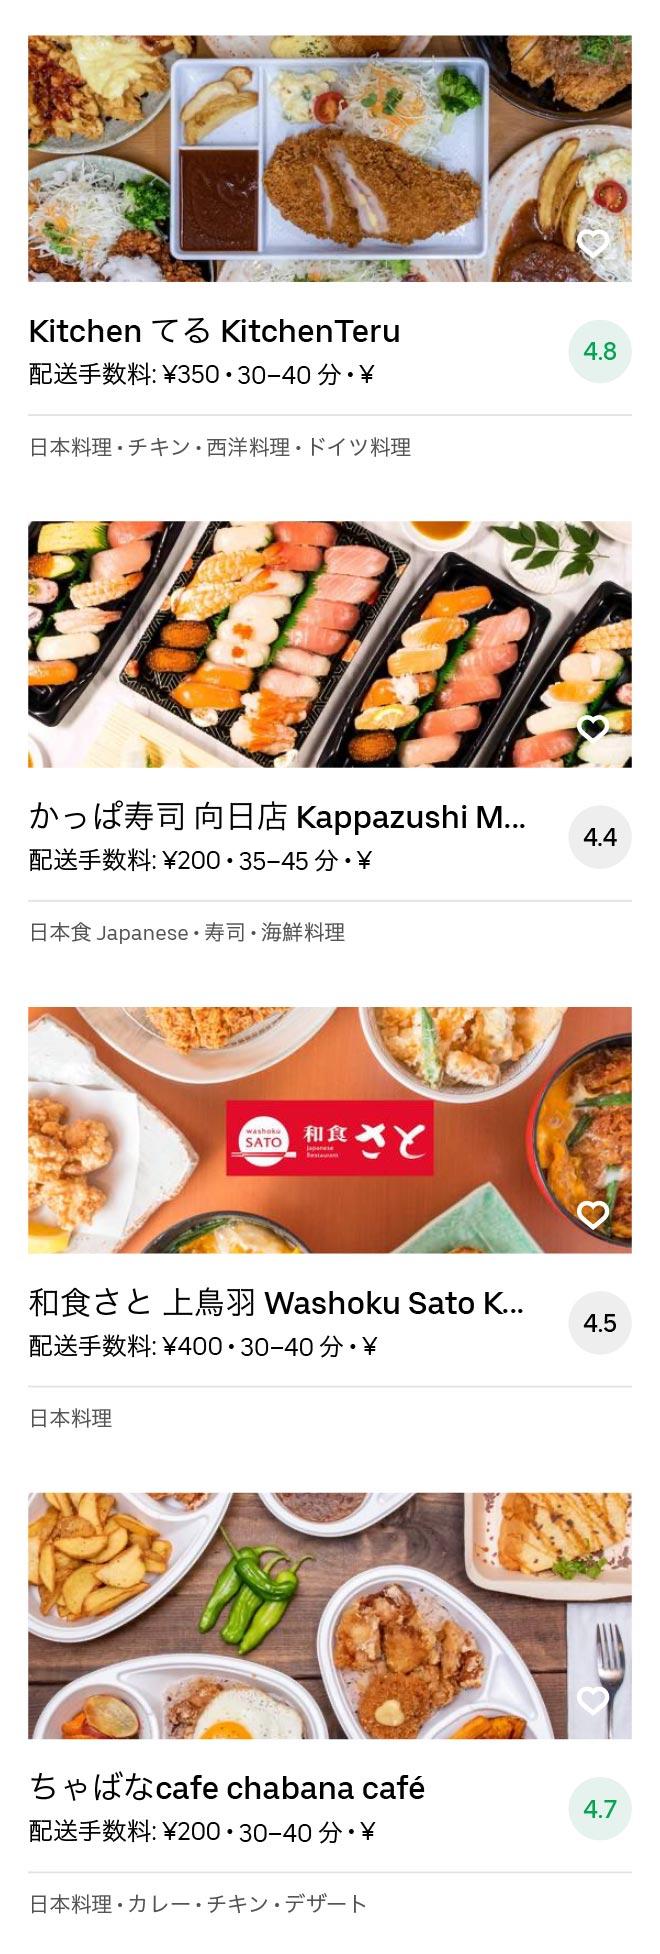 Mukoumachi menu 2008 07